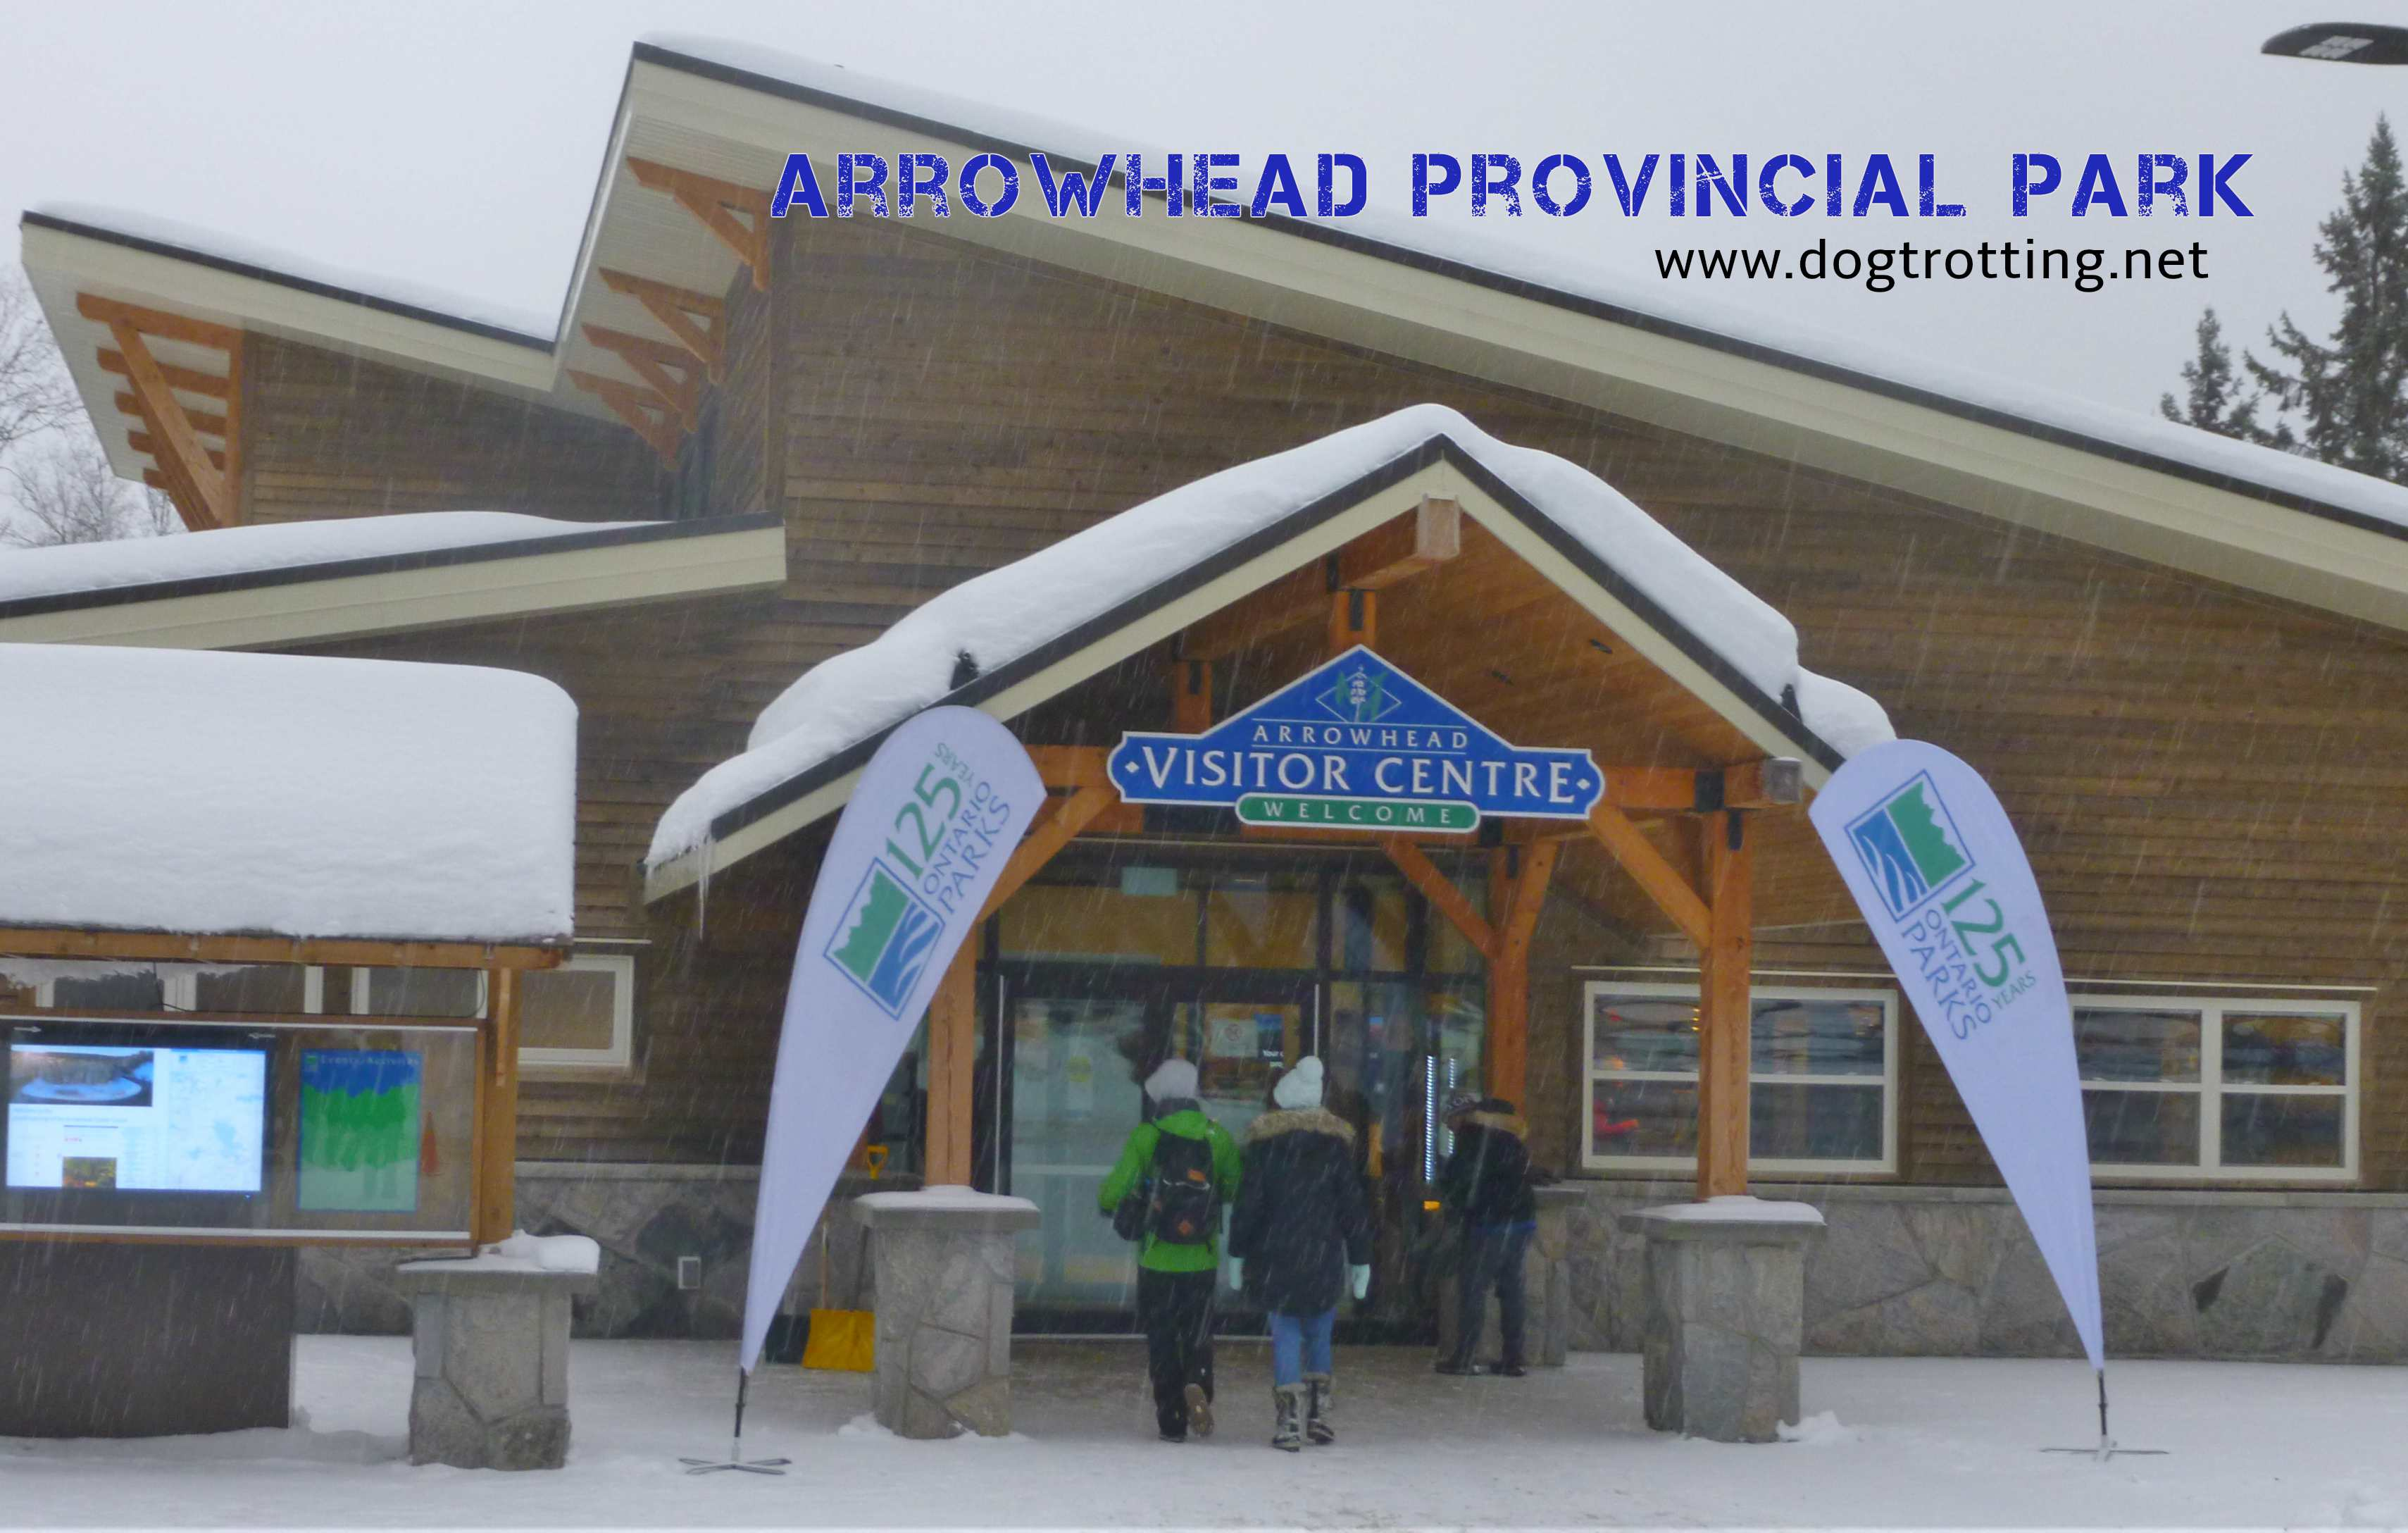 visitors centre at dog-friendly Arrownhead Provincial Park, Ontario, Canada dogtrotting.net